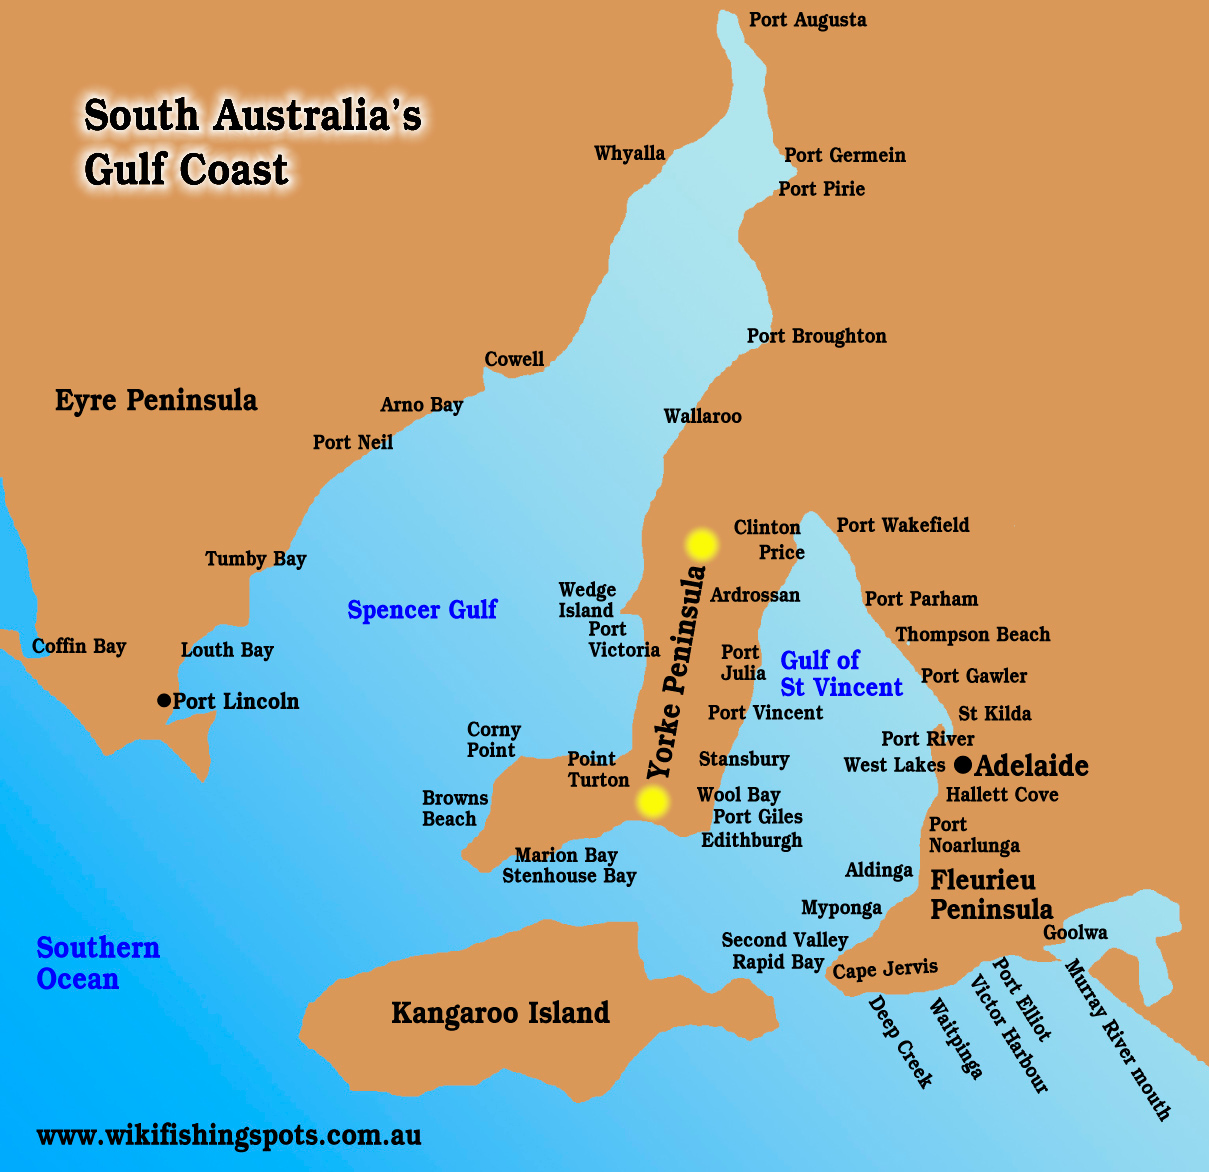 Yorke Peninsula, South Australia